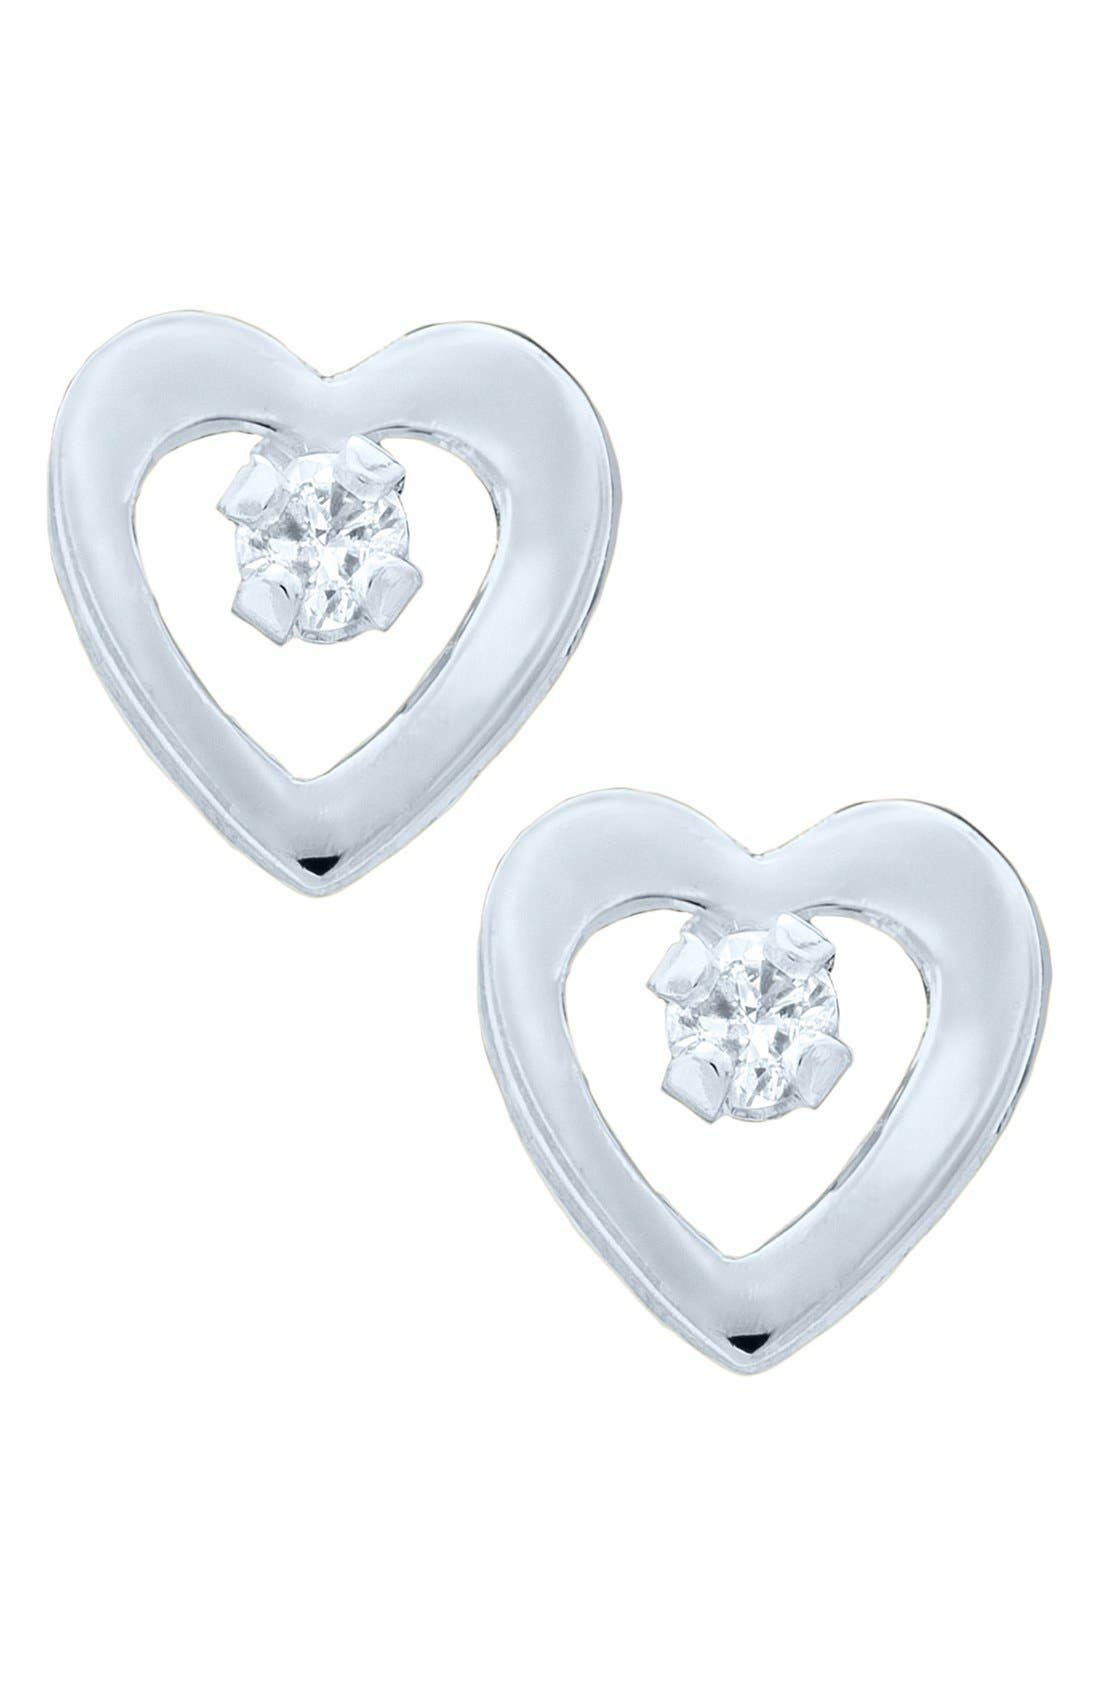 14k White Gold & Diamond Heart Earrings,                             Main thumbnail 1, color,                             SILVER